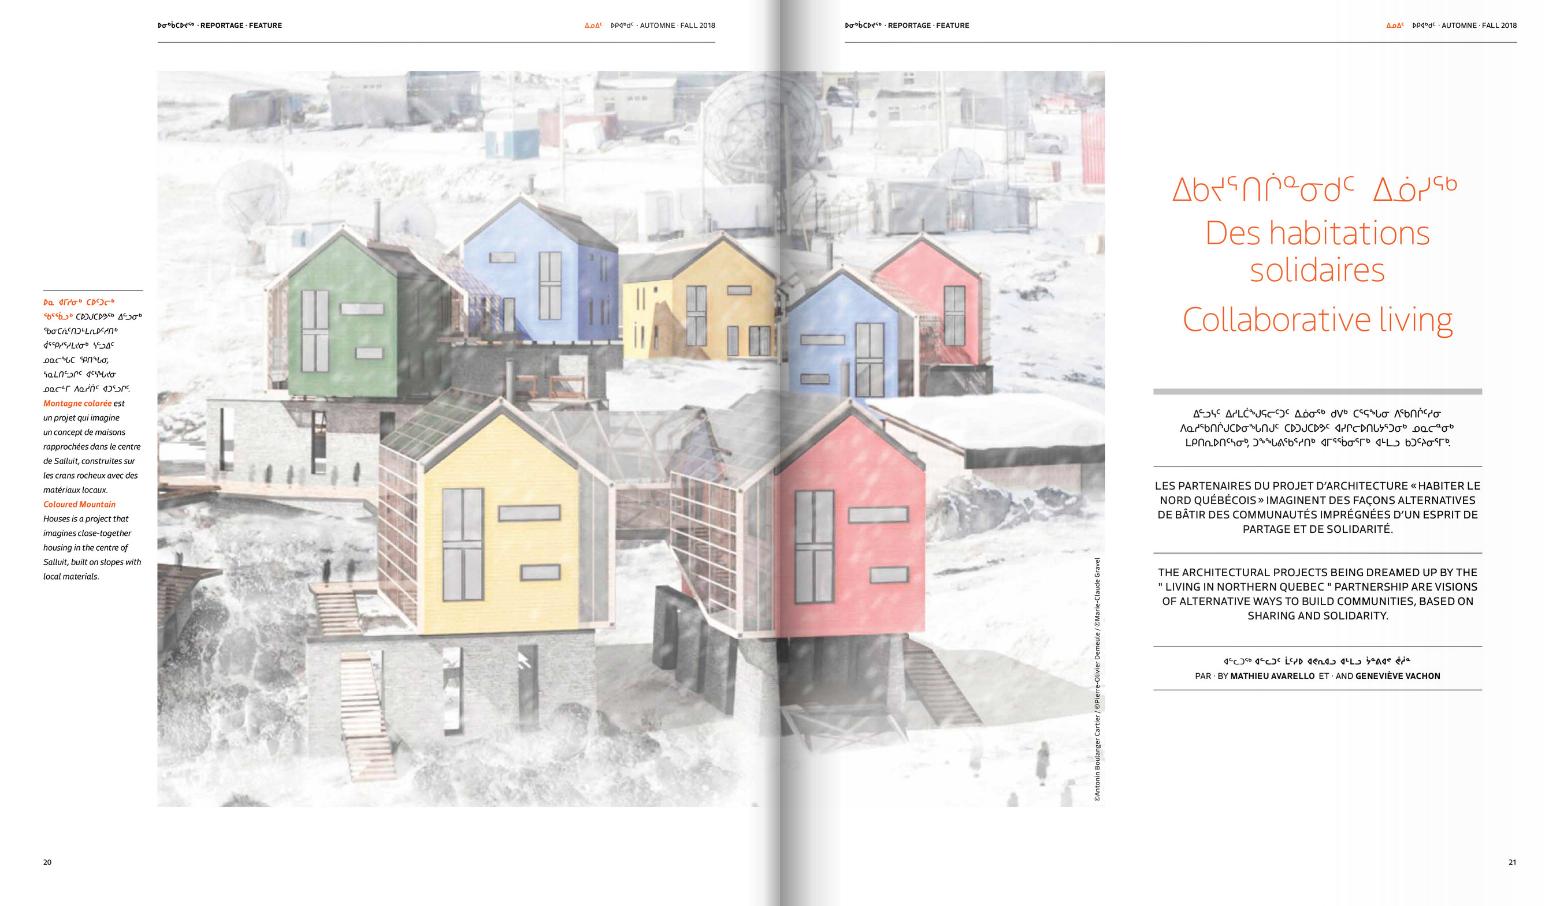 Inuit_Magazine_Vol5No1_1de4